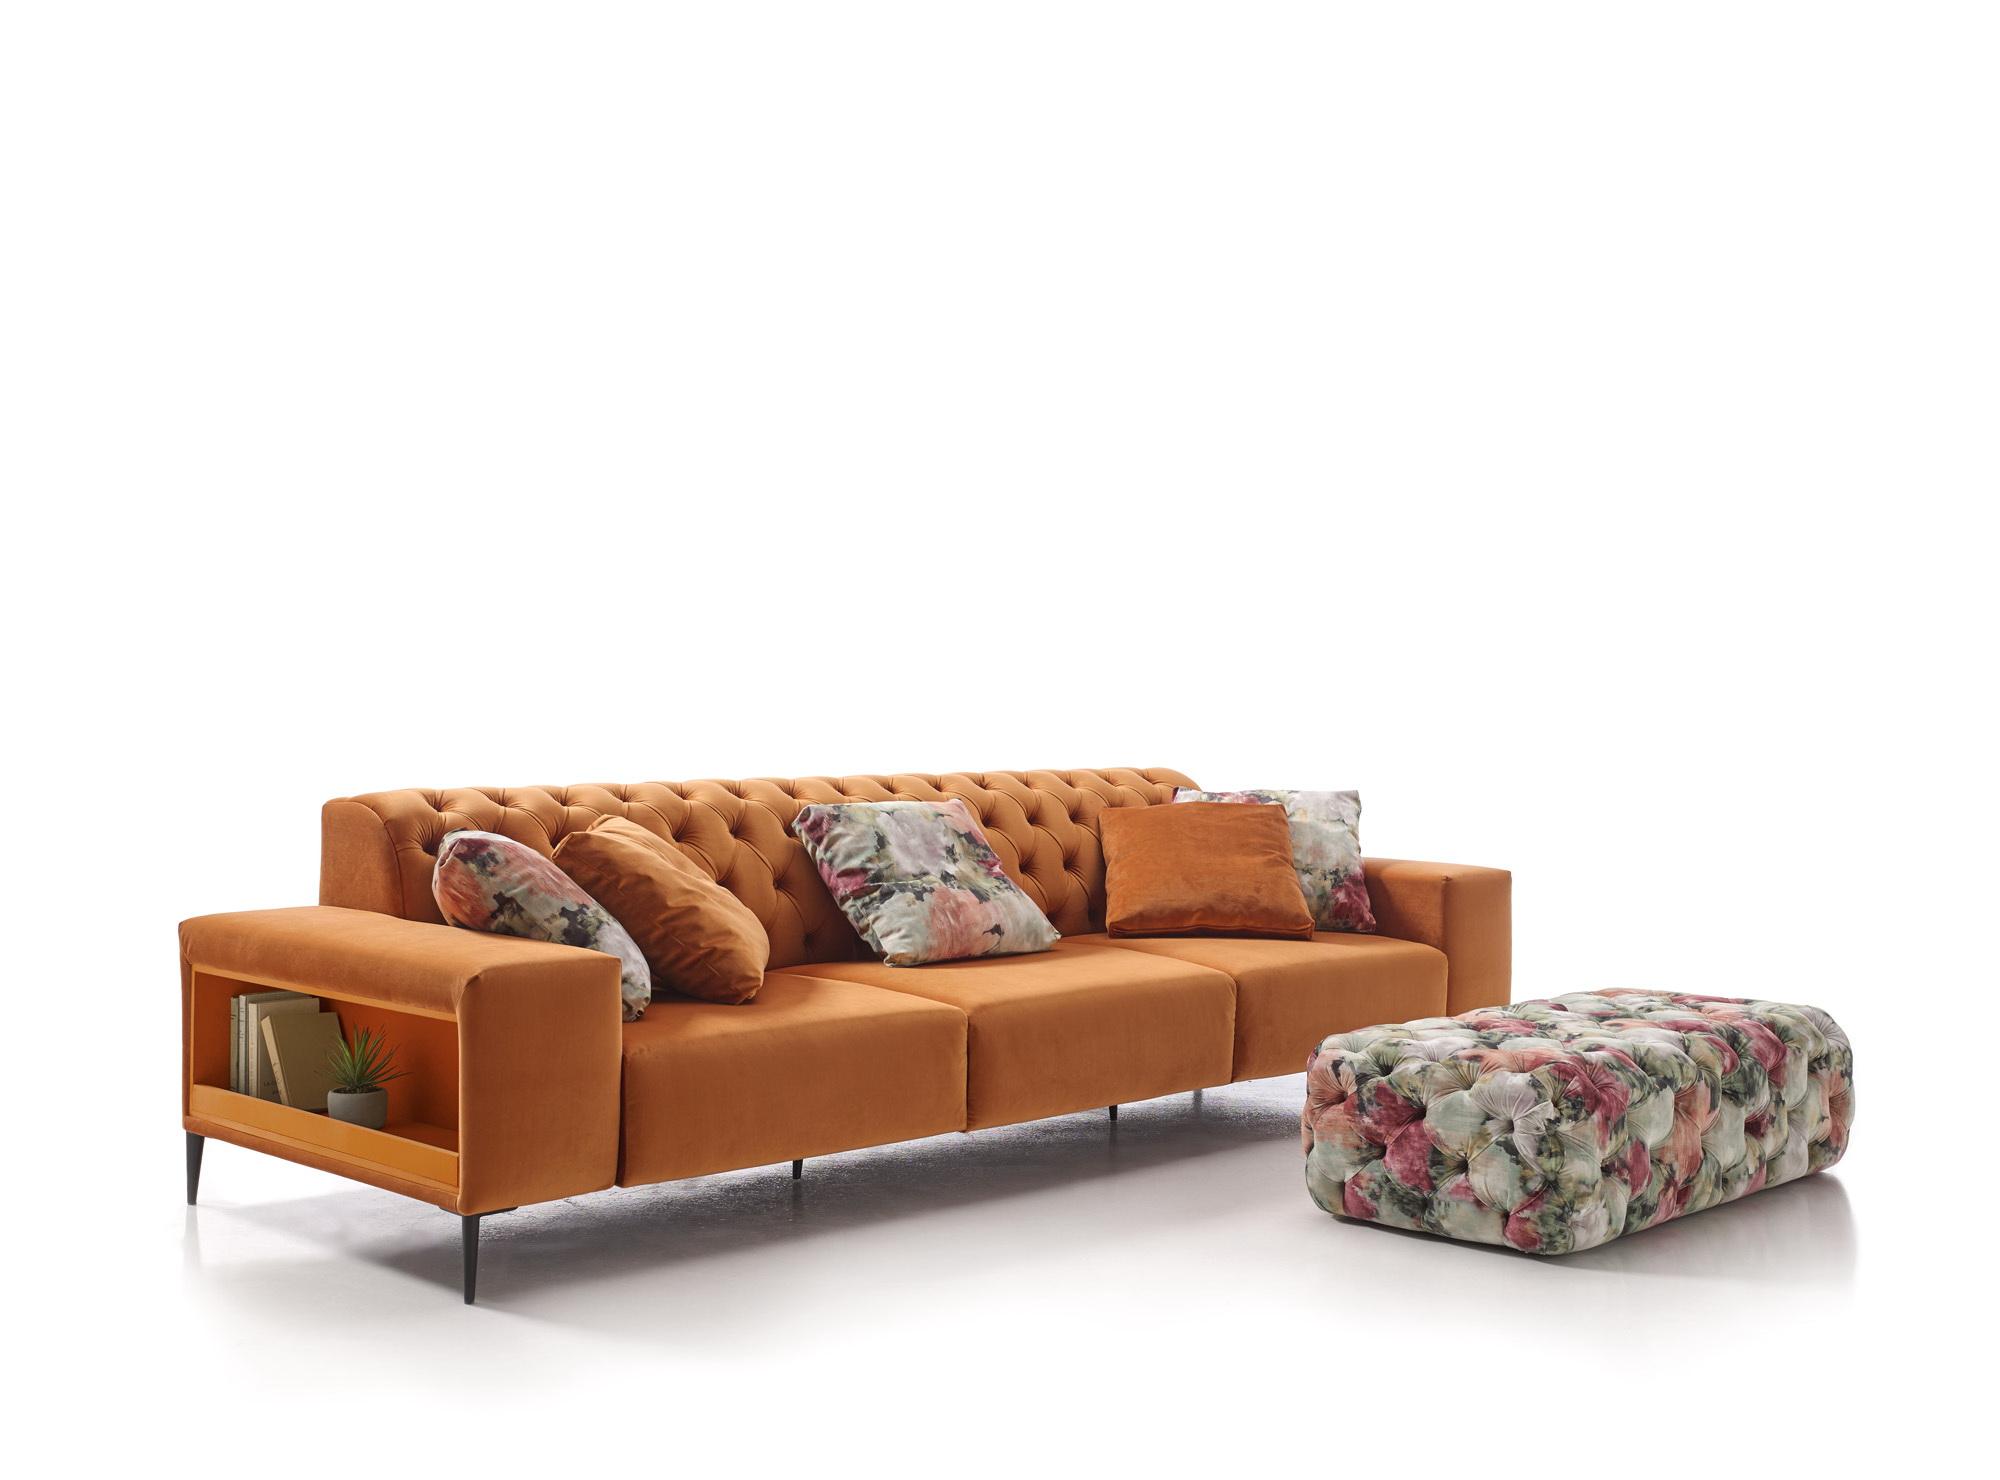 ORIGEN Capitoné sofá asientos fijos by Reyes Ordoñez SOFÁ 4 PLAZAS 01.4 de venta en Muebles ANTOÑÁN León